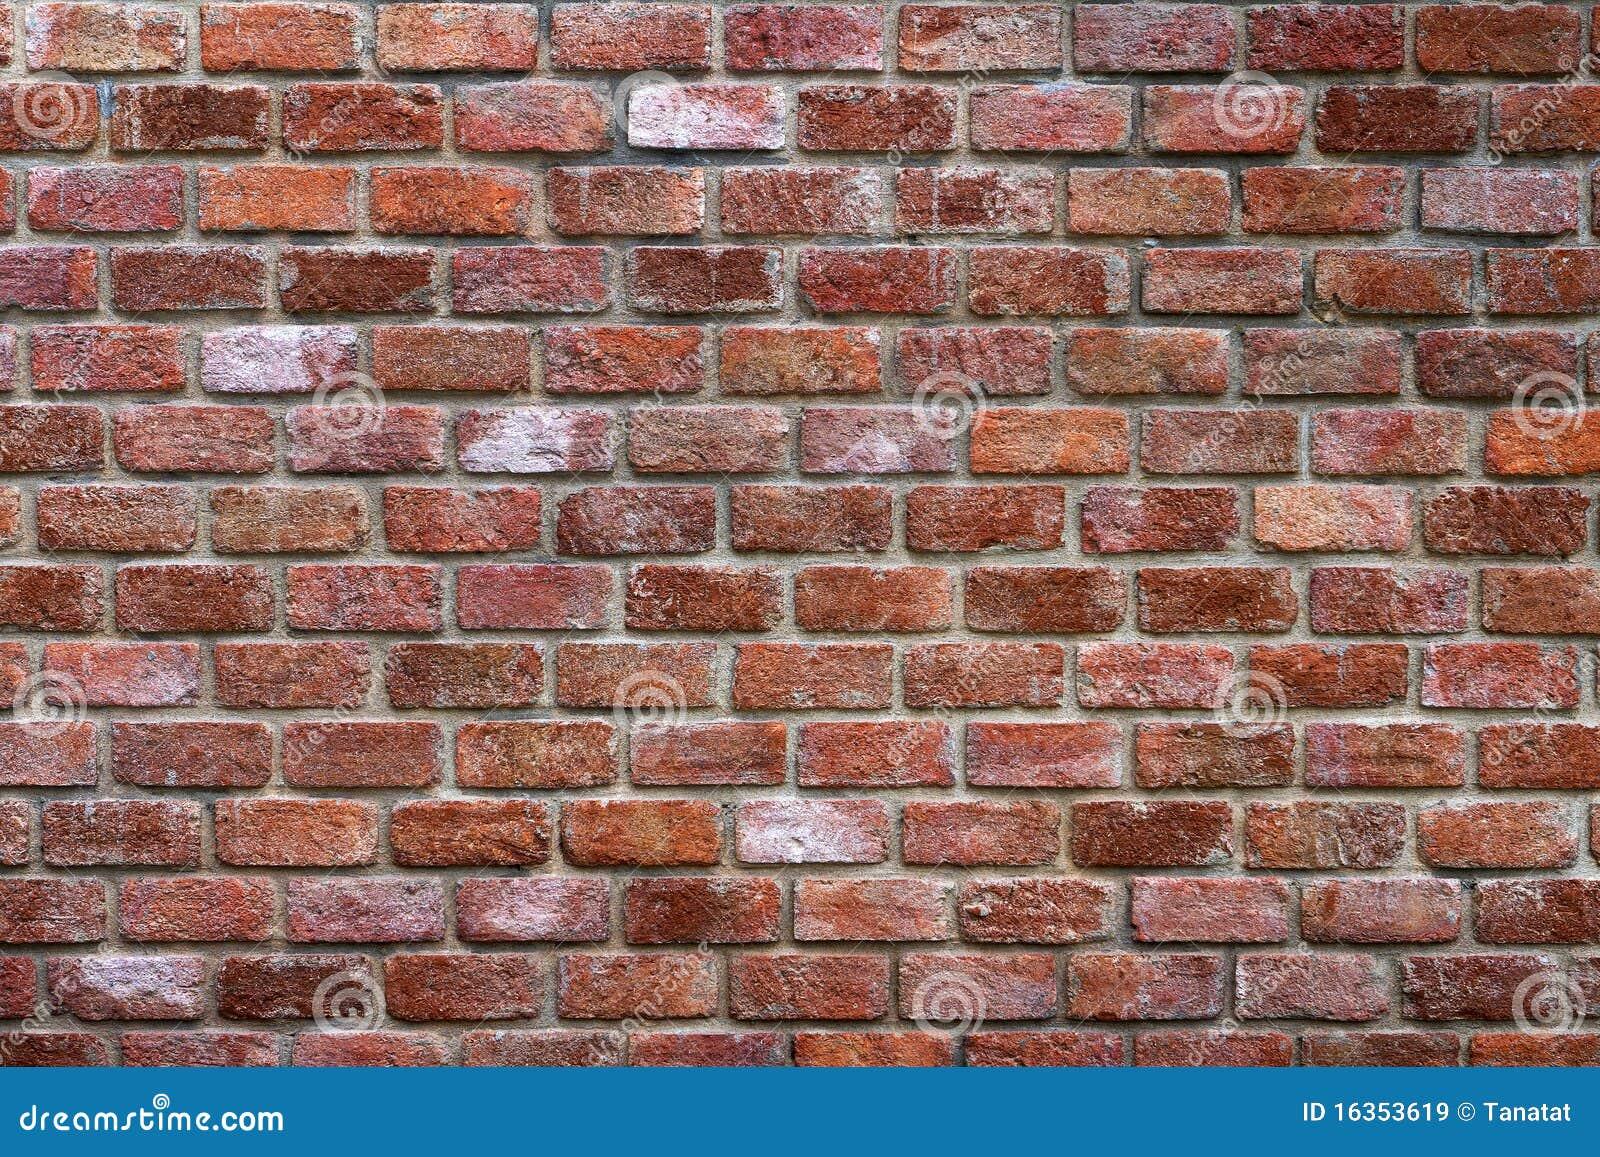 Old Brick Wall Royalty Free Stock Images Image 16353619